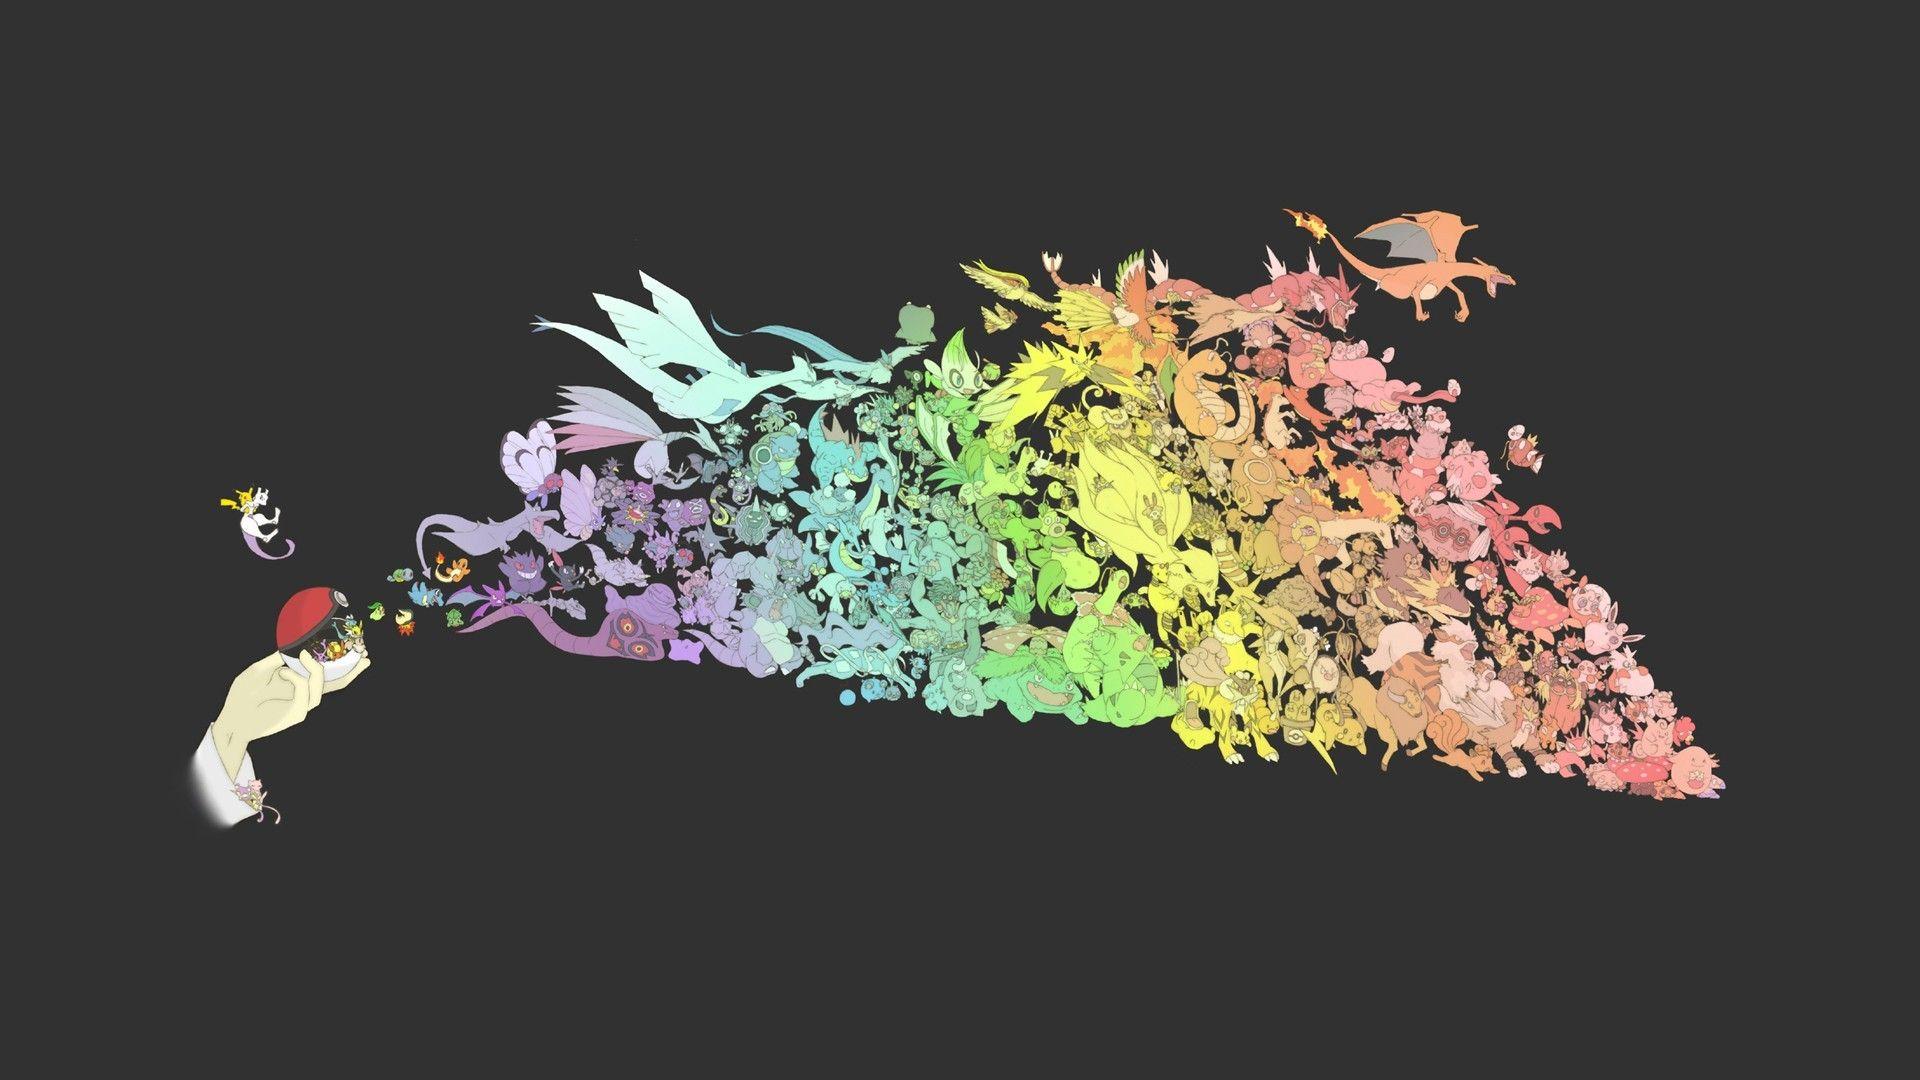 Pokemon Wallpaper Free Large Images Anime Wallpaper Pokemon Backgrounds Cute Pokemon Wallpaper